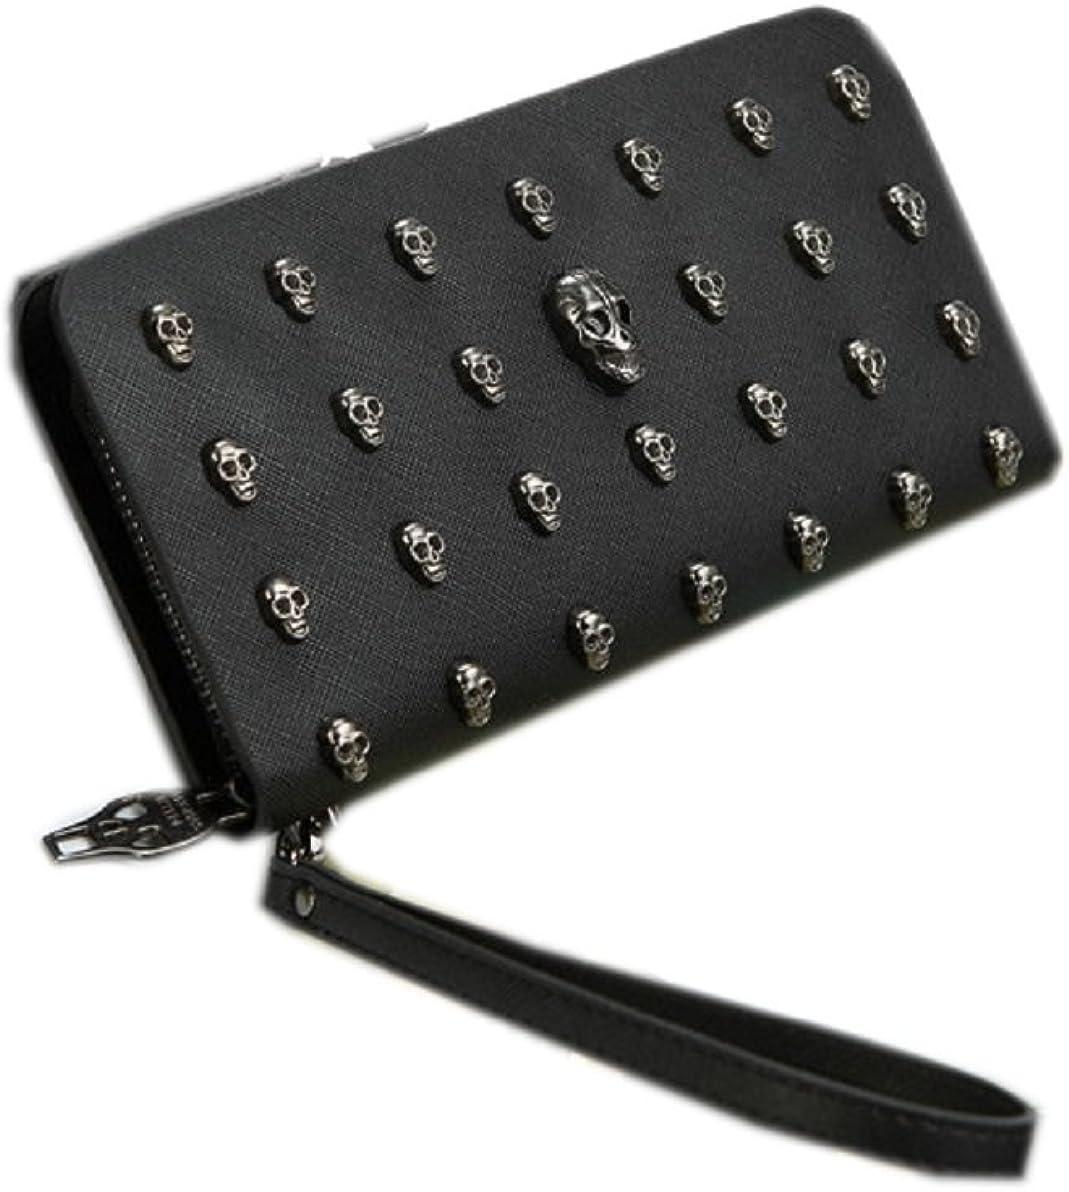 JJ-GOGO Men and Women Retro Punk Skull Rivet Wallet Clutch Bags Wristlet Handbags